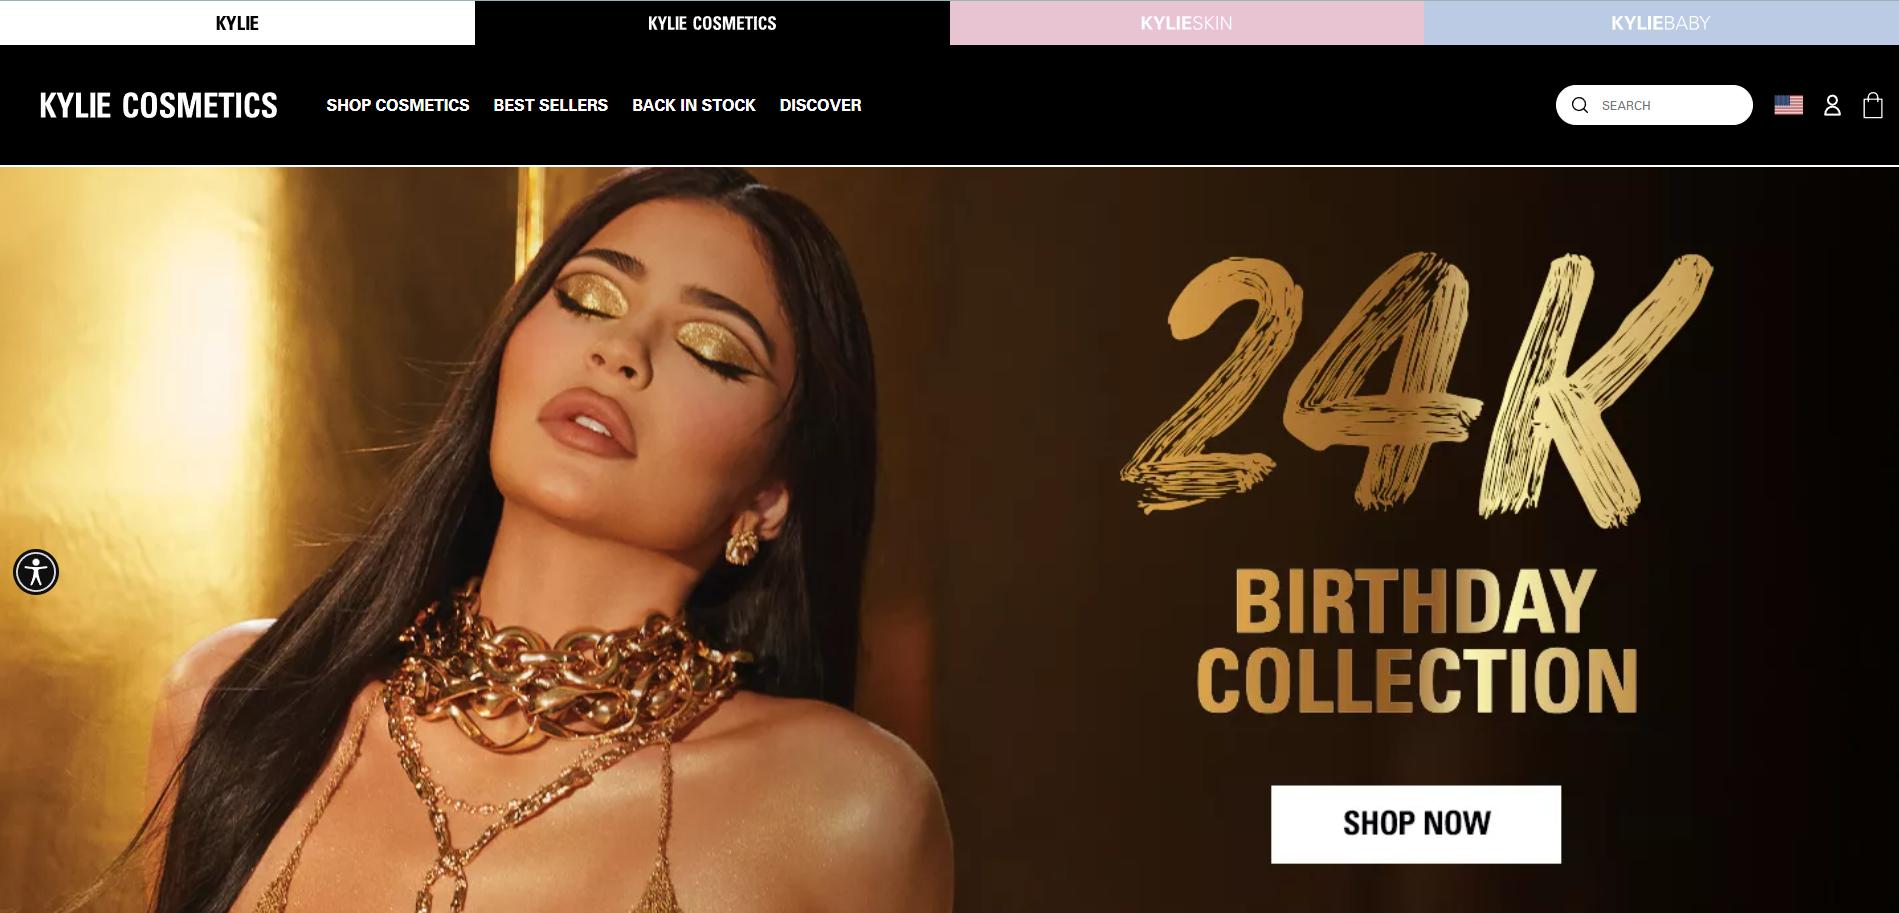 Kylie cosmetics website